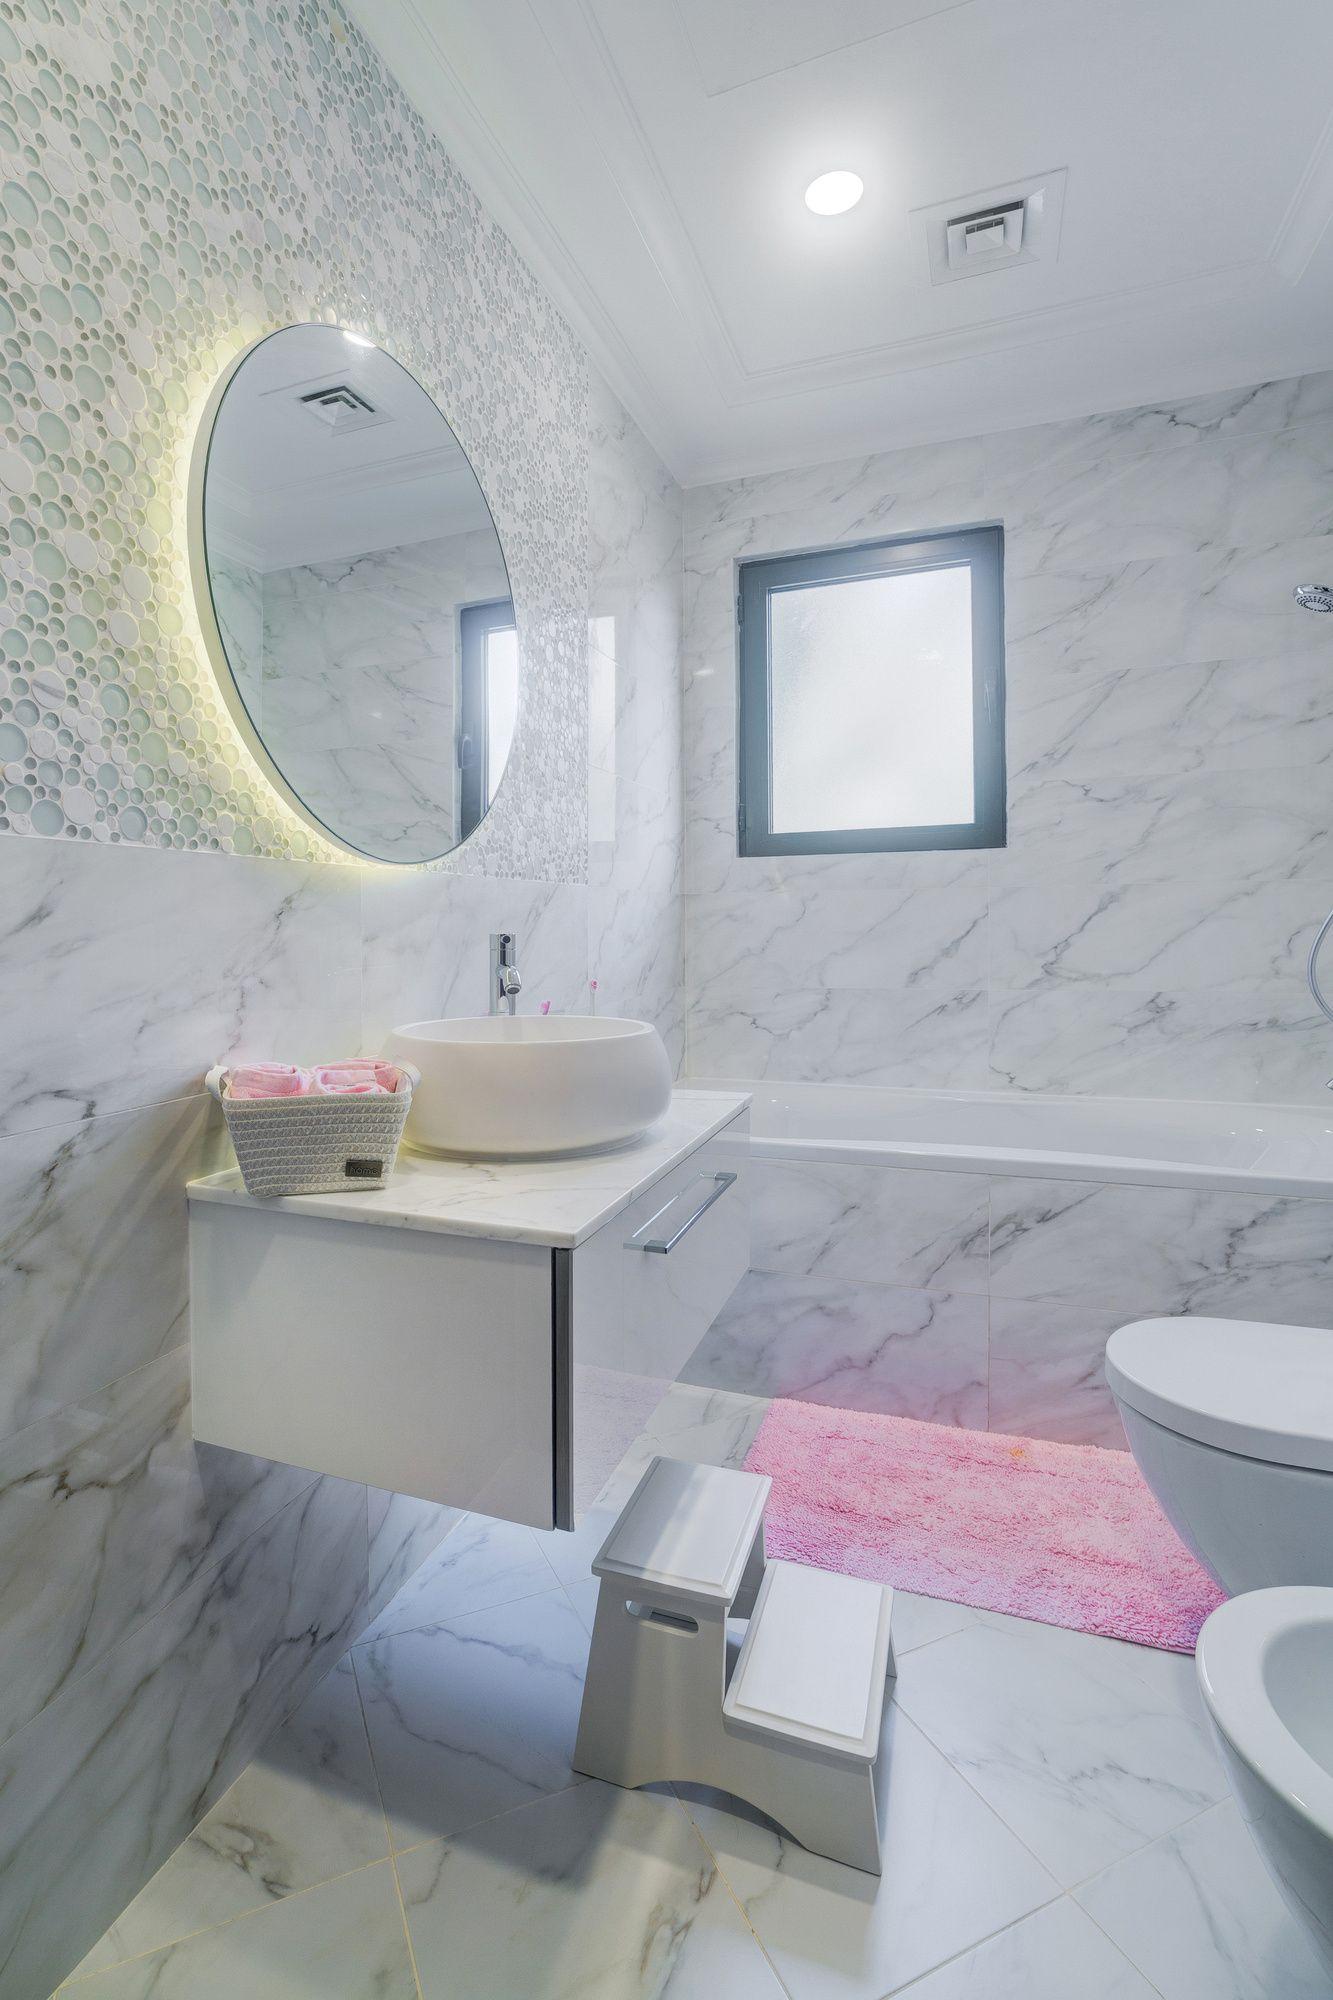 Lady Bathroom Renovation In Palm Jumeirah, Luxury Villa On